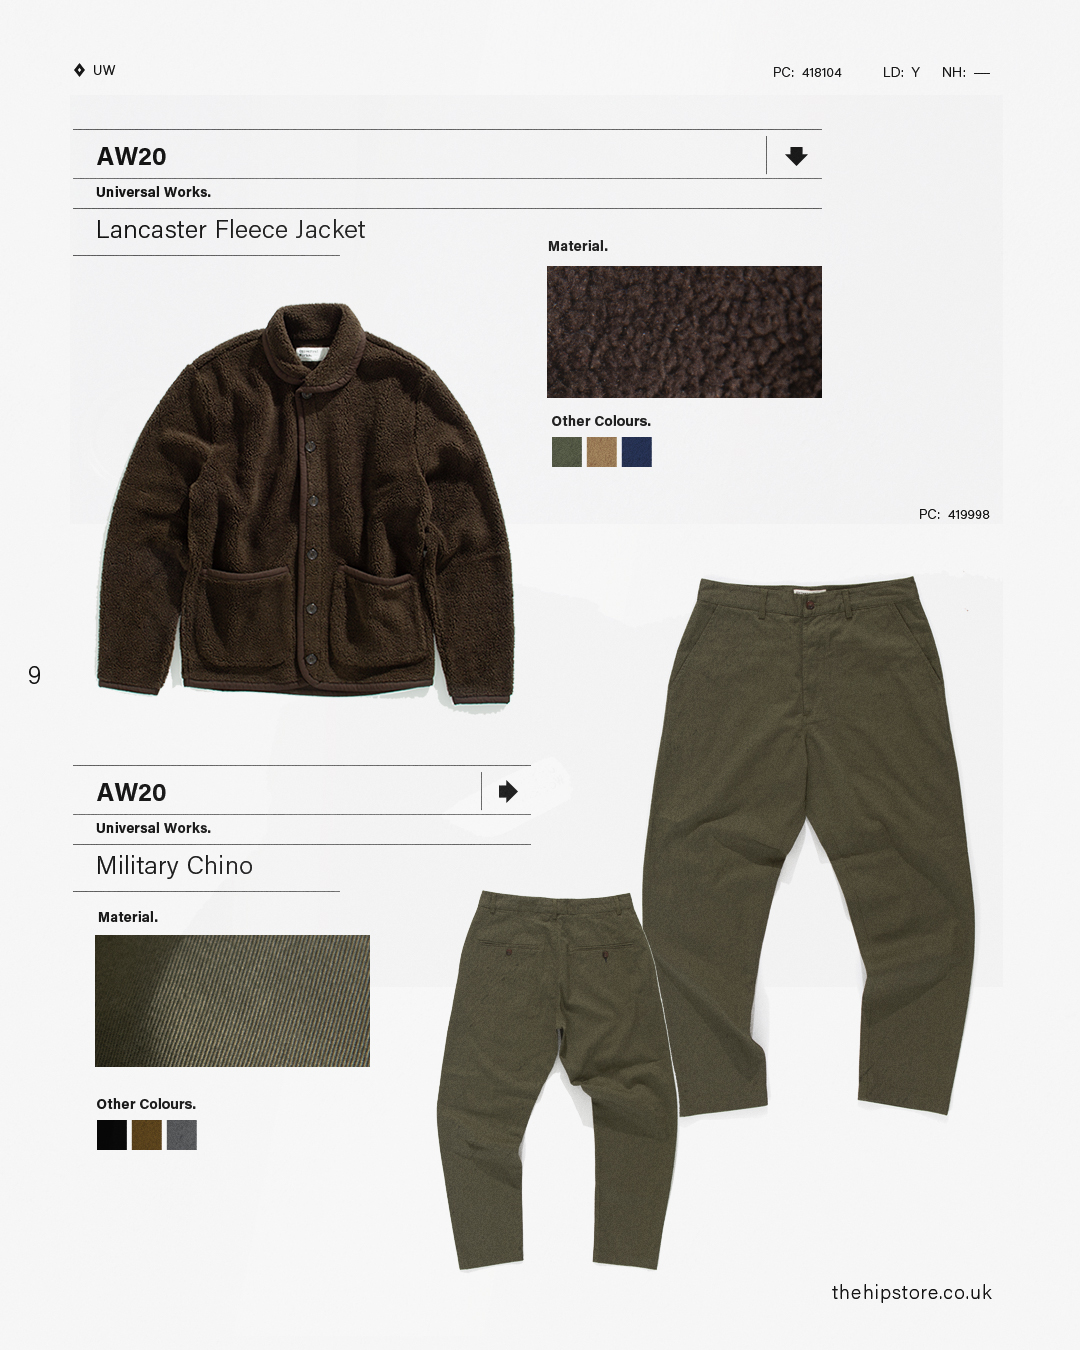 HIP Staff Picks: Universal Works AW20 Lancaster Fleece Jacket Military Chino